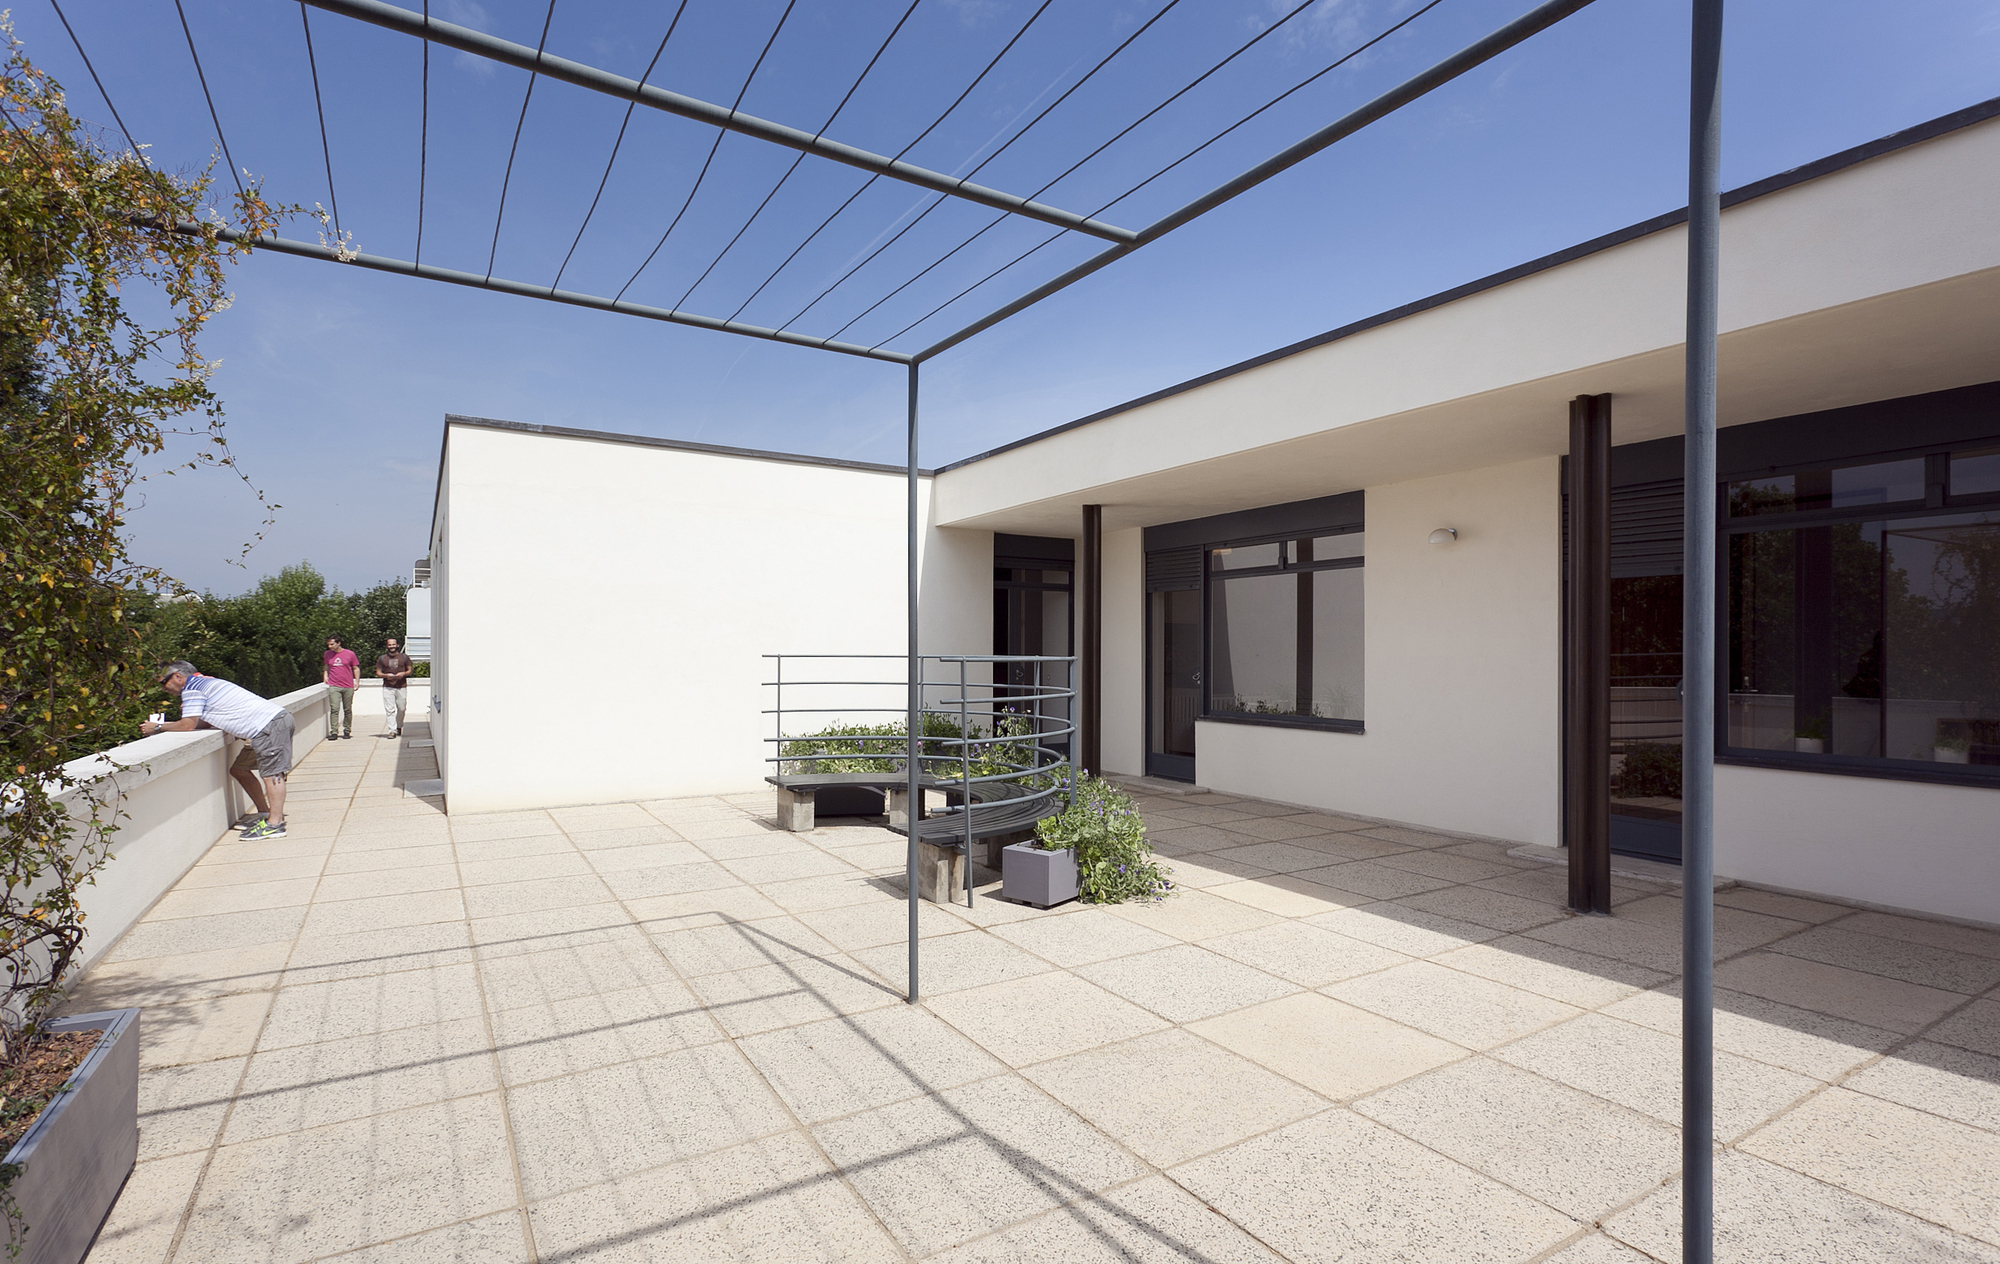 gallery of ad classics villa tugendhat mies van der rohe 24. Black Bedroom Furniture Sets. Home Design Ideas